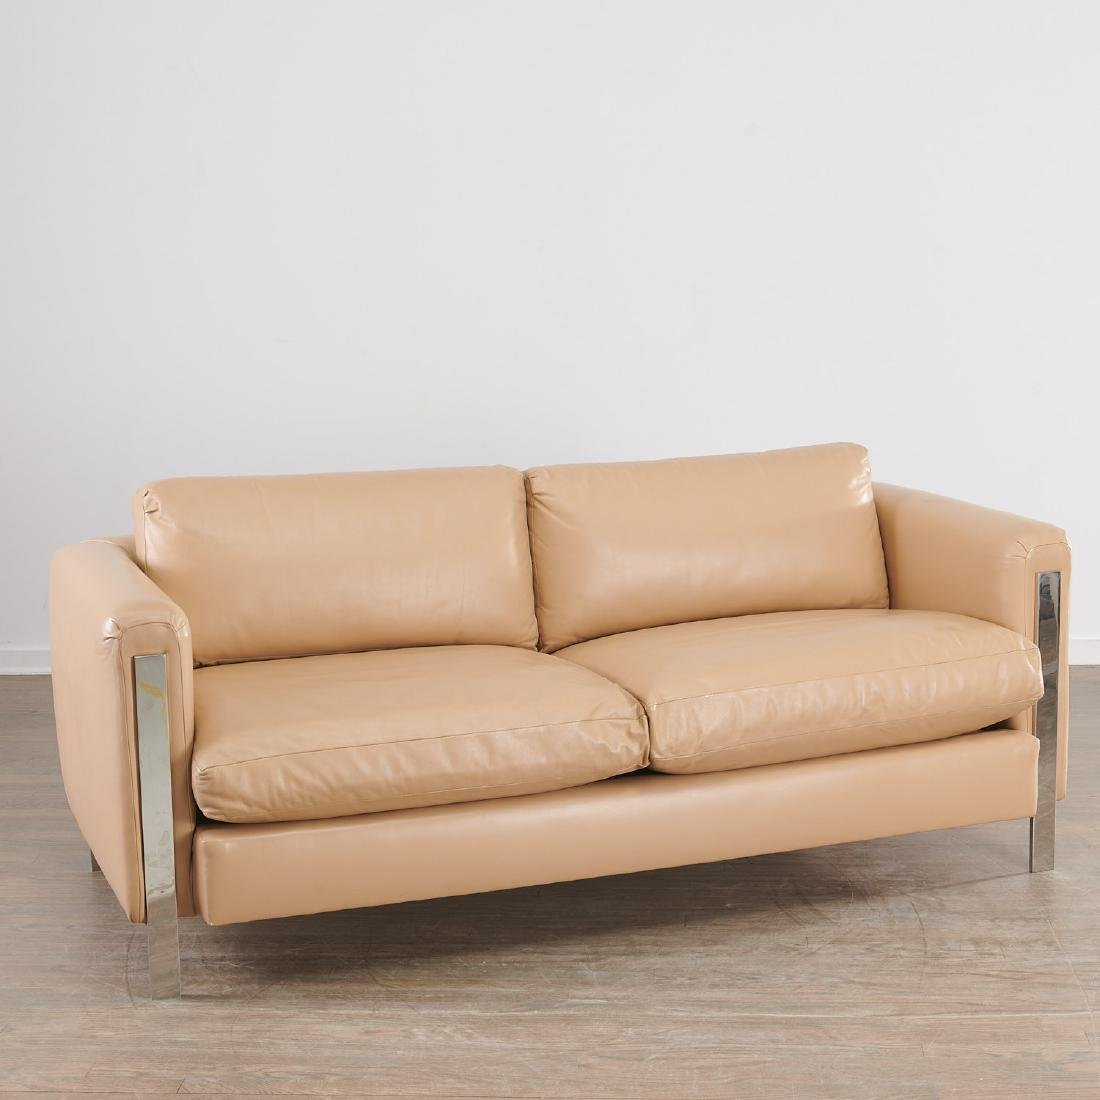 Milo Baughman (attrib.) leather sofa